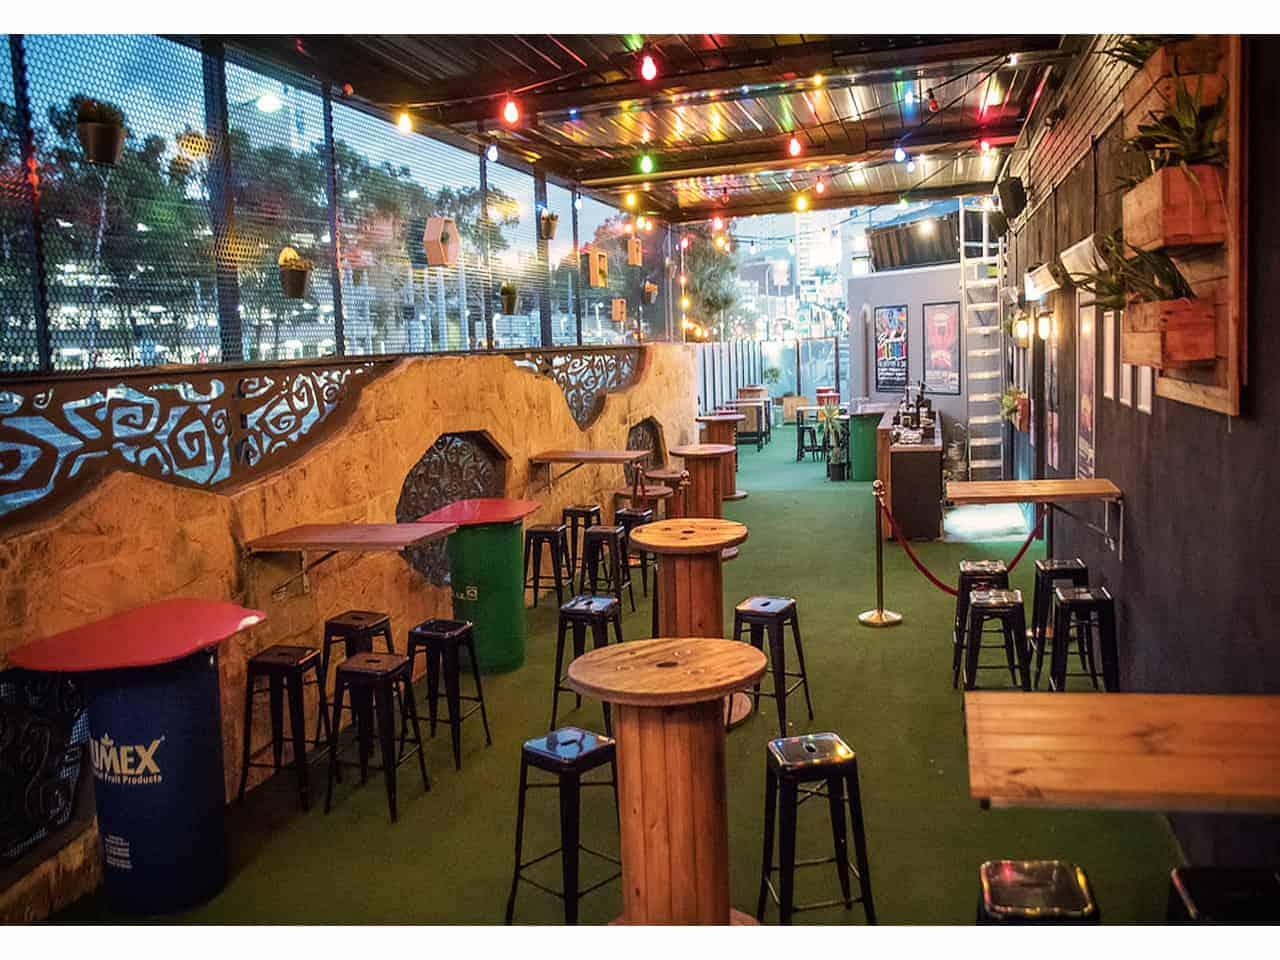 Unique bar venue